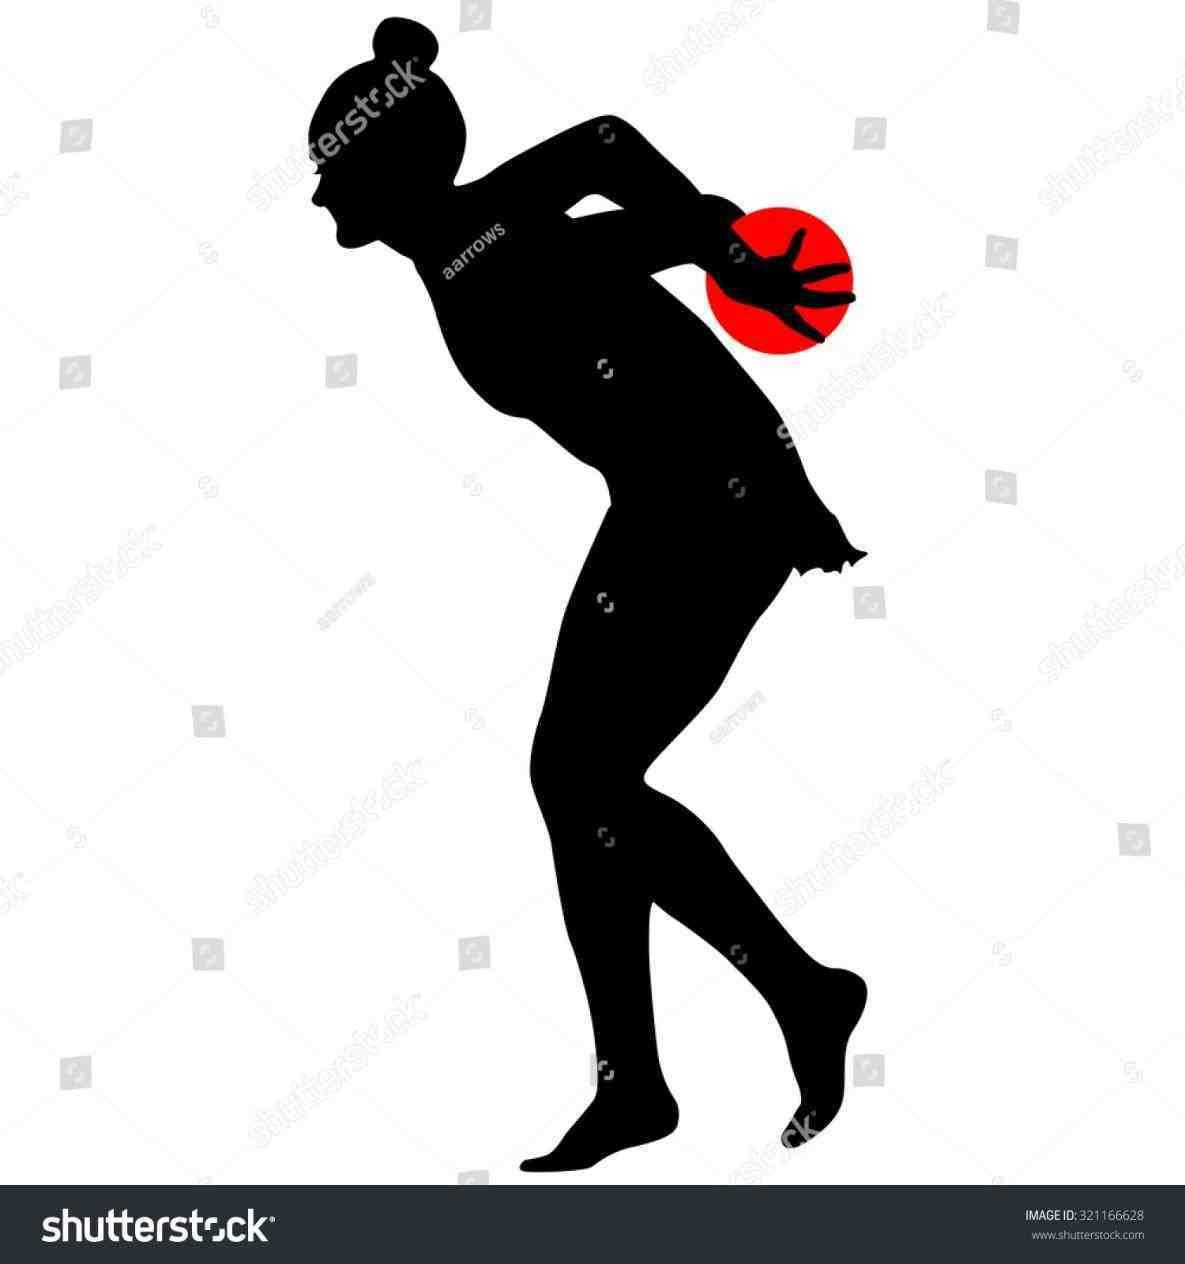 1185x1264 White Illustration Black Female Kickboxing Silhouette Silhouette